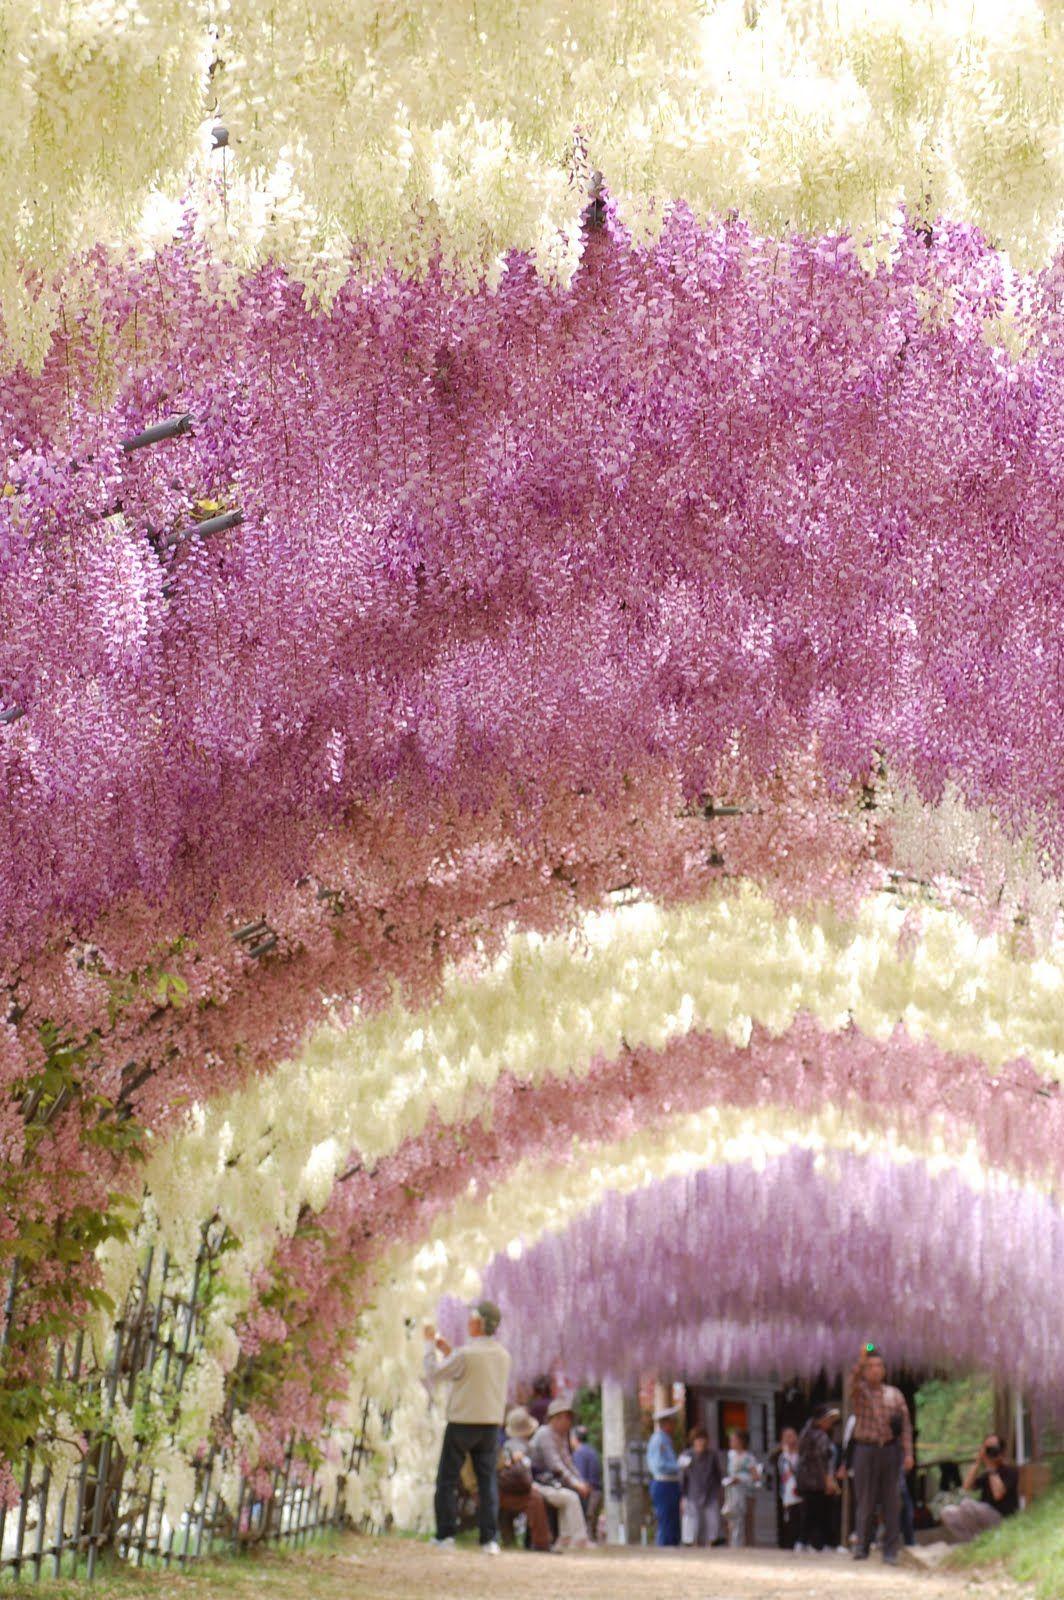 Wisteria flower tunnel, Kawachi Fuji Garden - Kitakyushu, Fukuoka, Japan